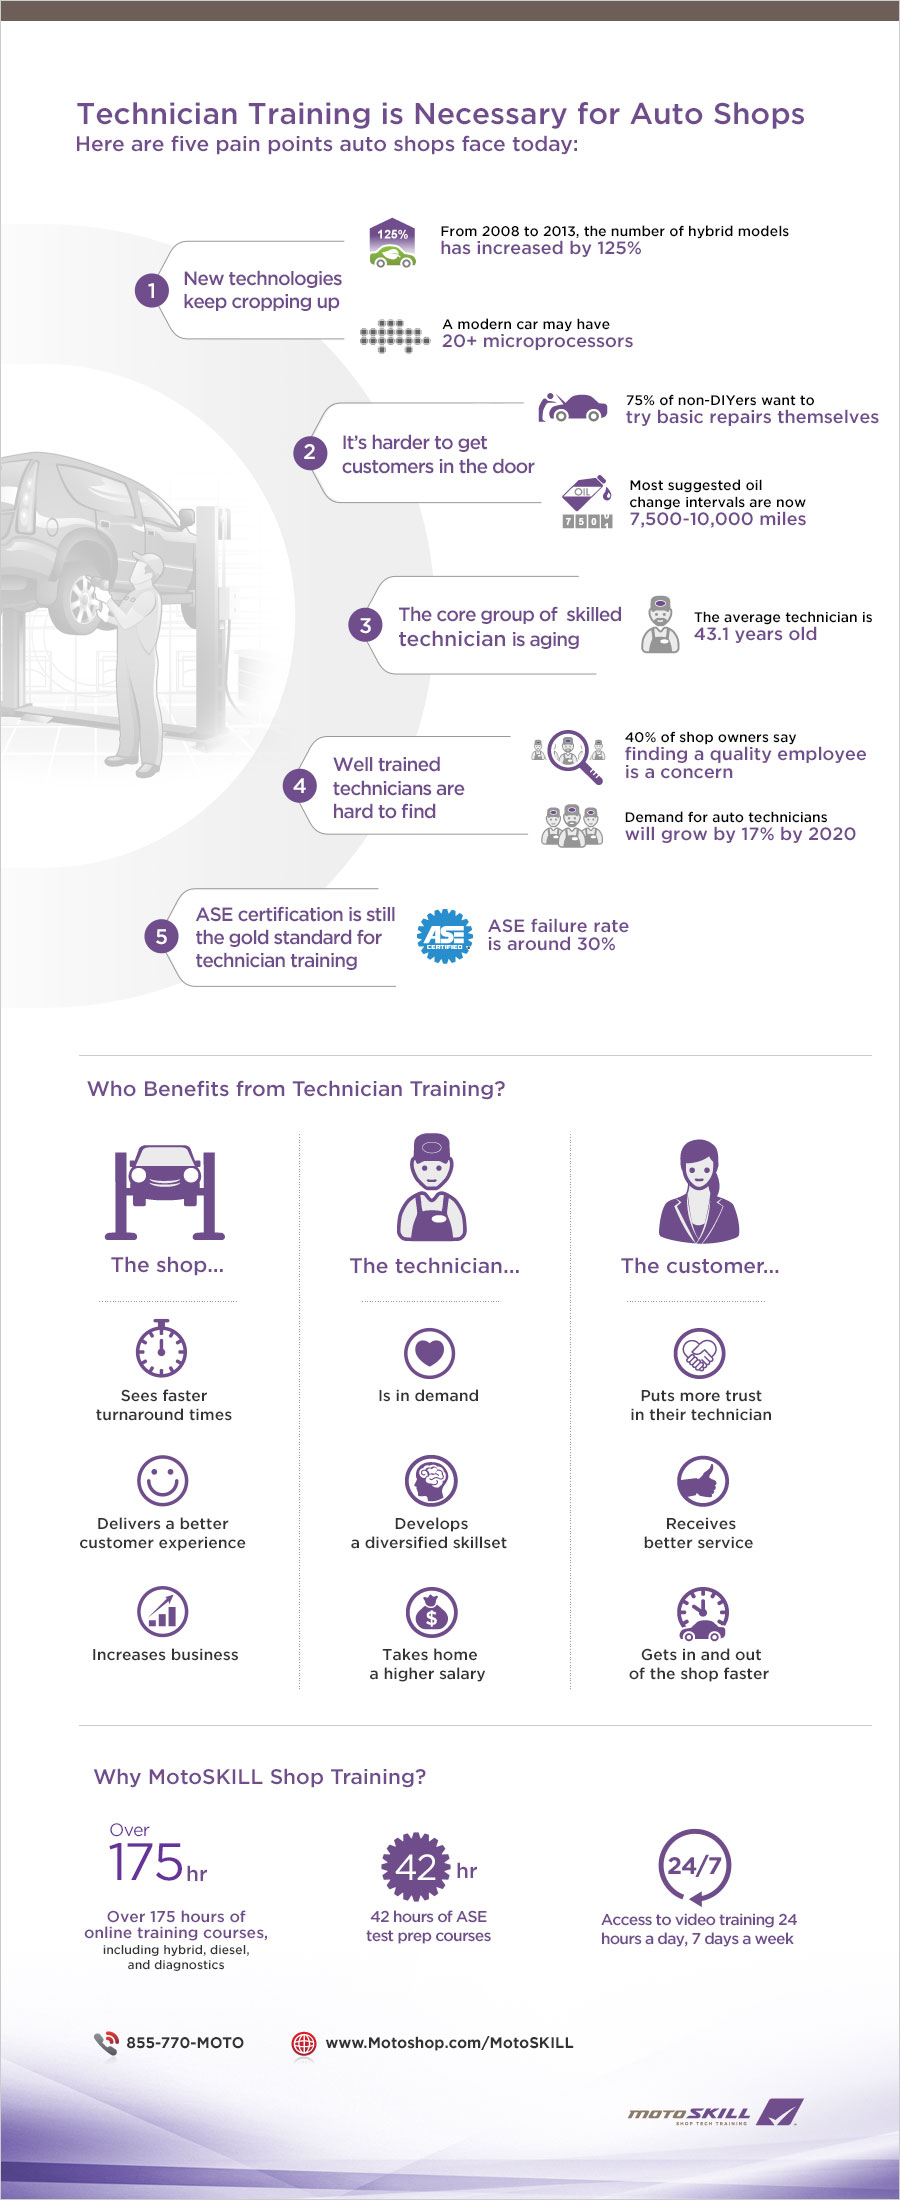 MotoSKILL Technician Training Infographic